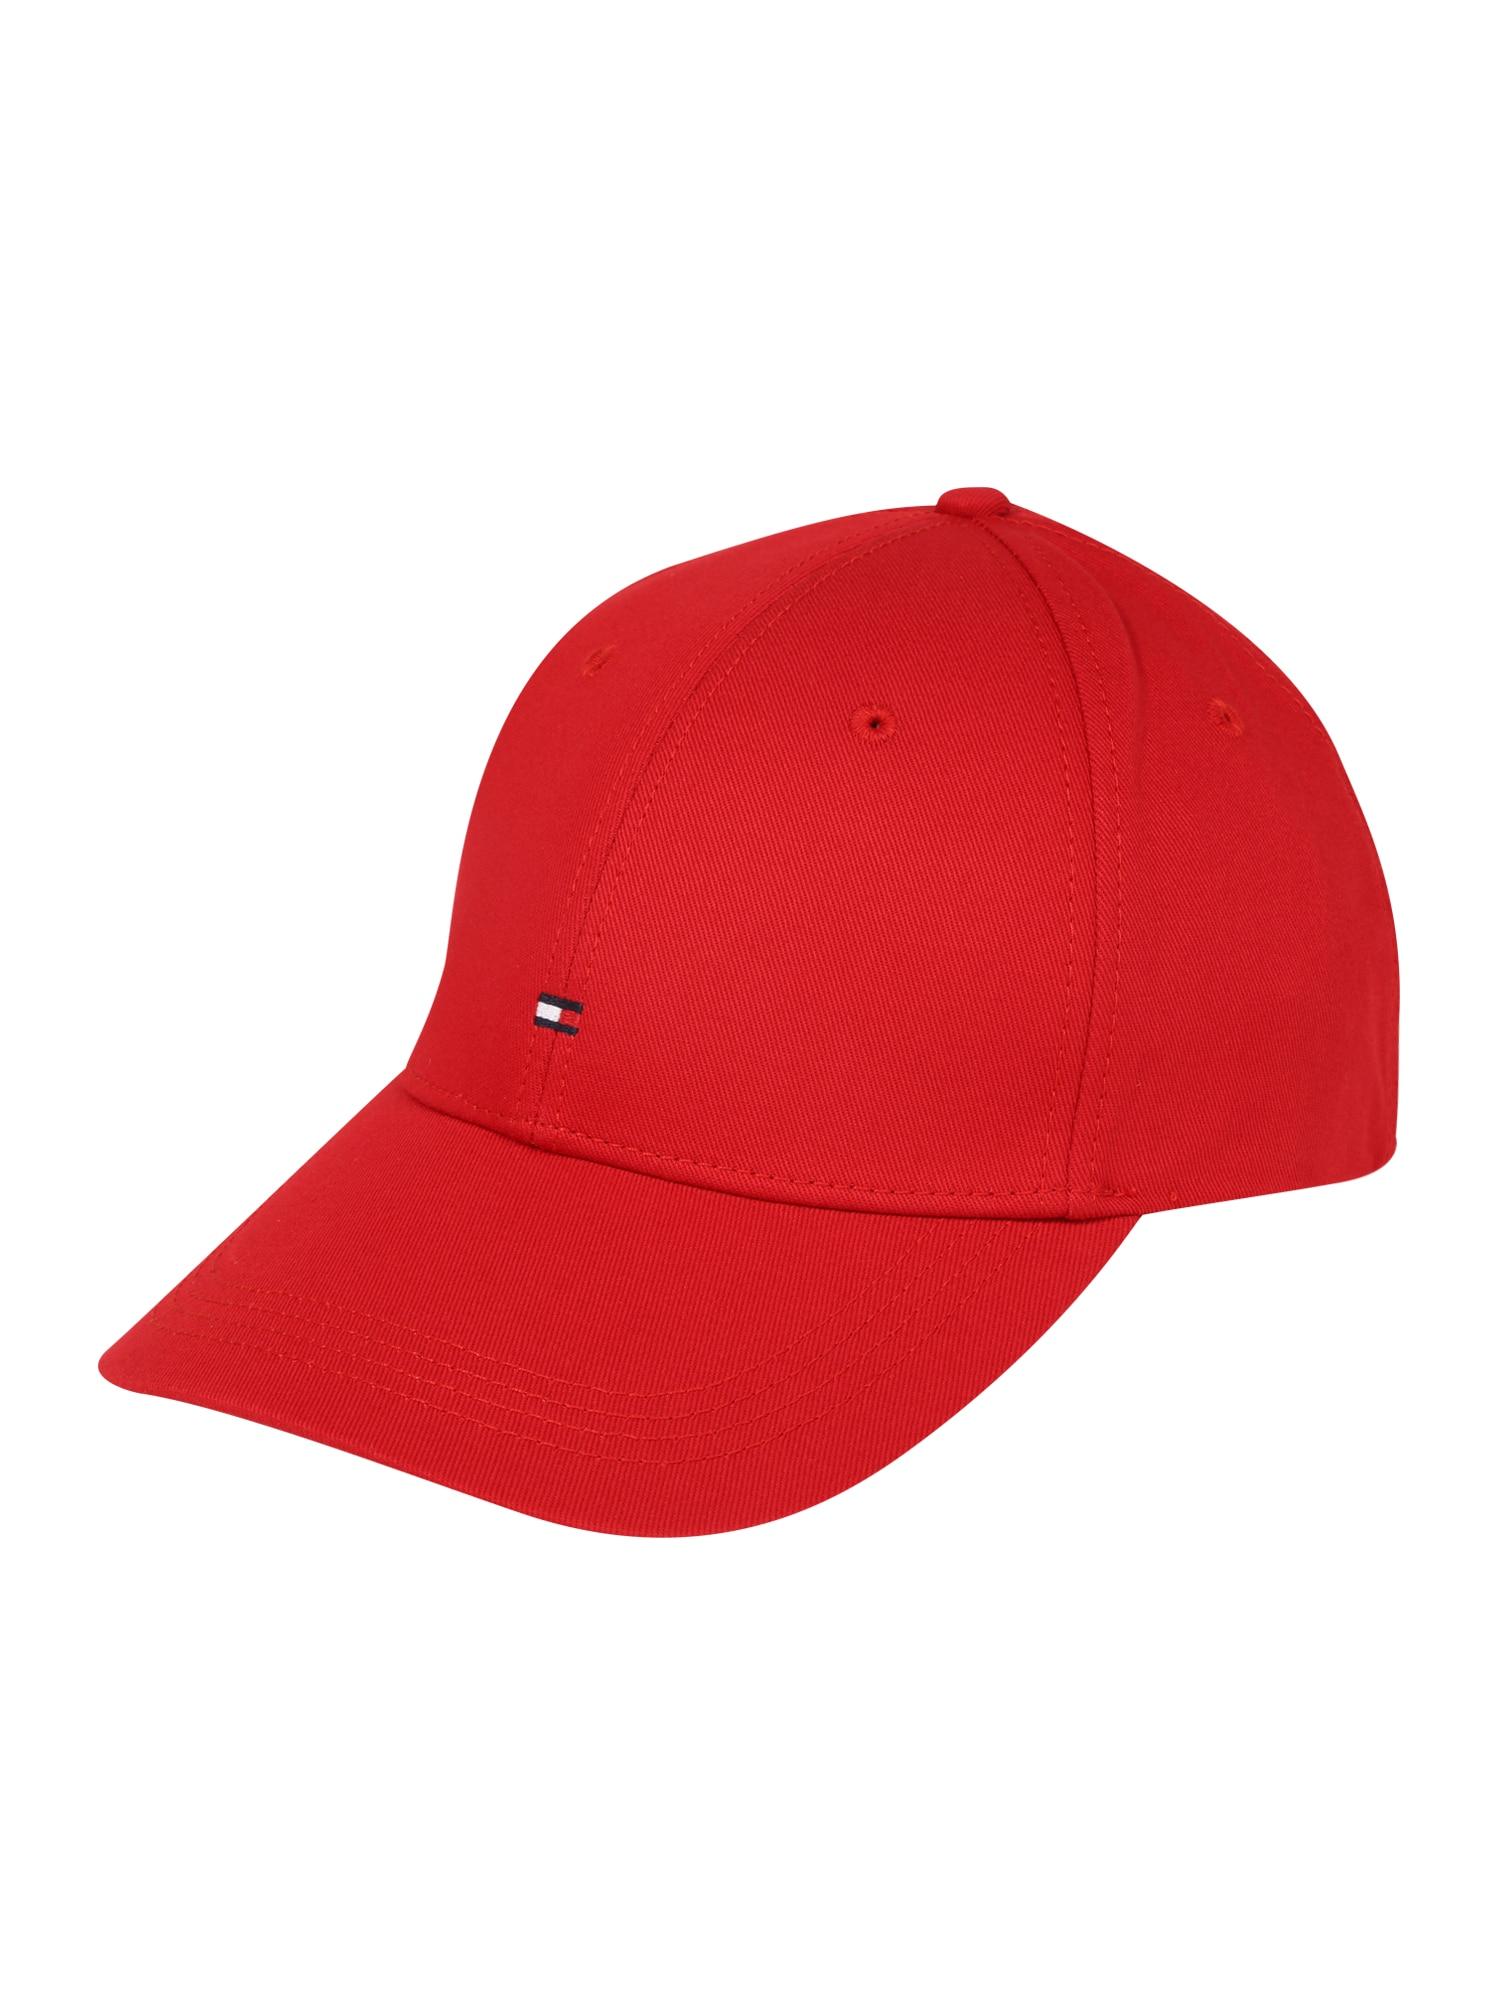 TOMMY HILFIGER Kepurė 'Classic' raudona